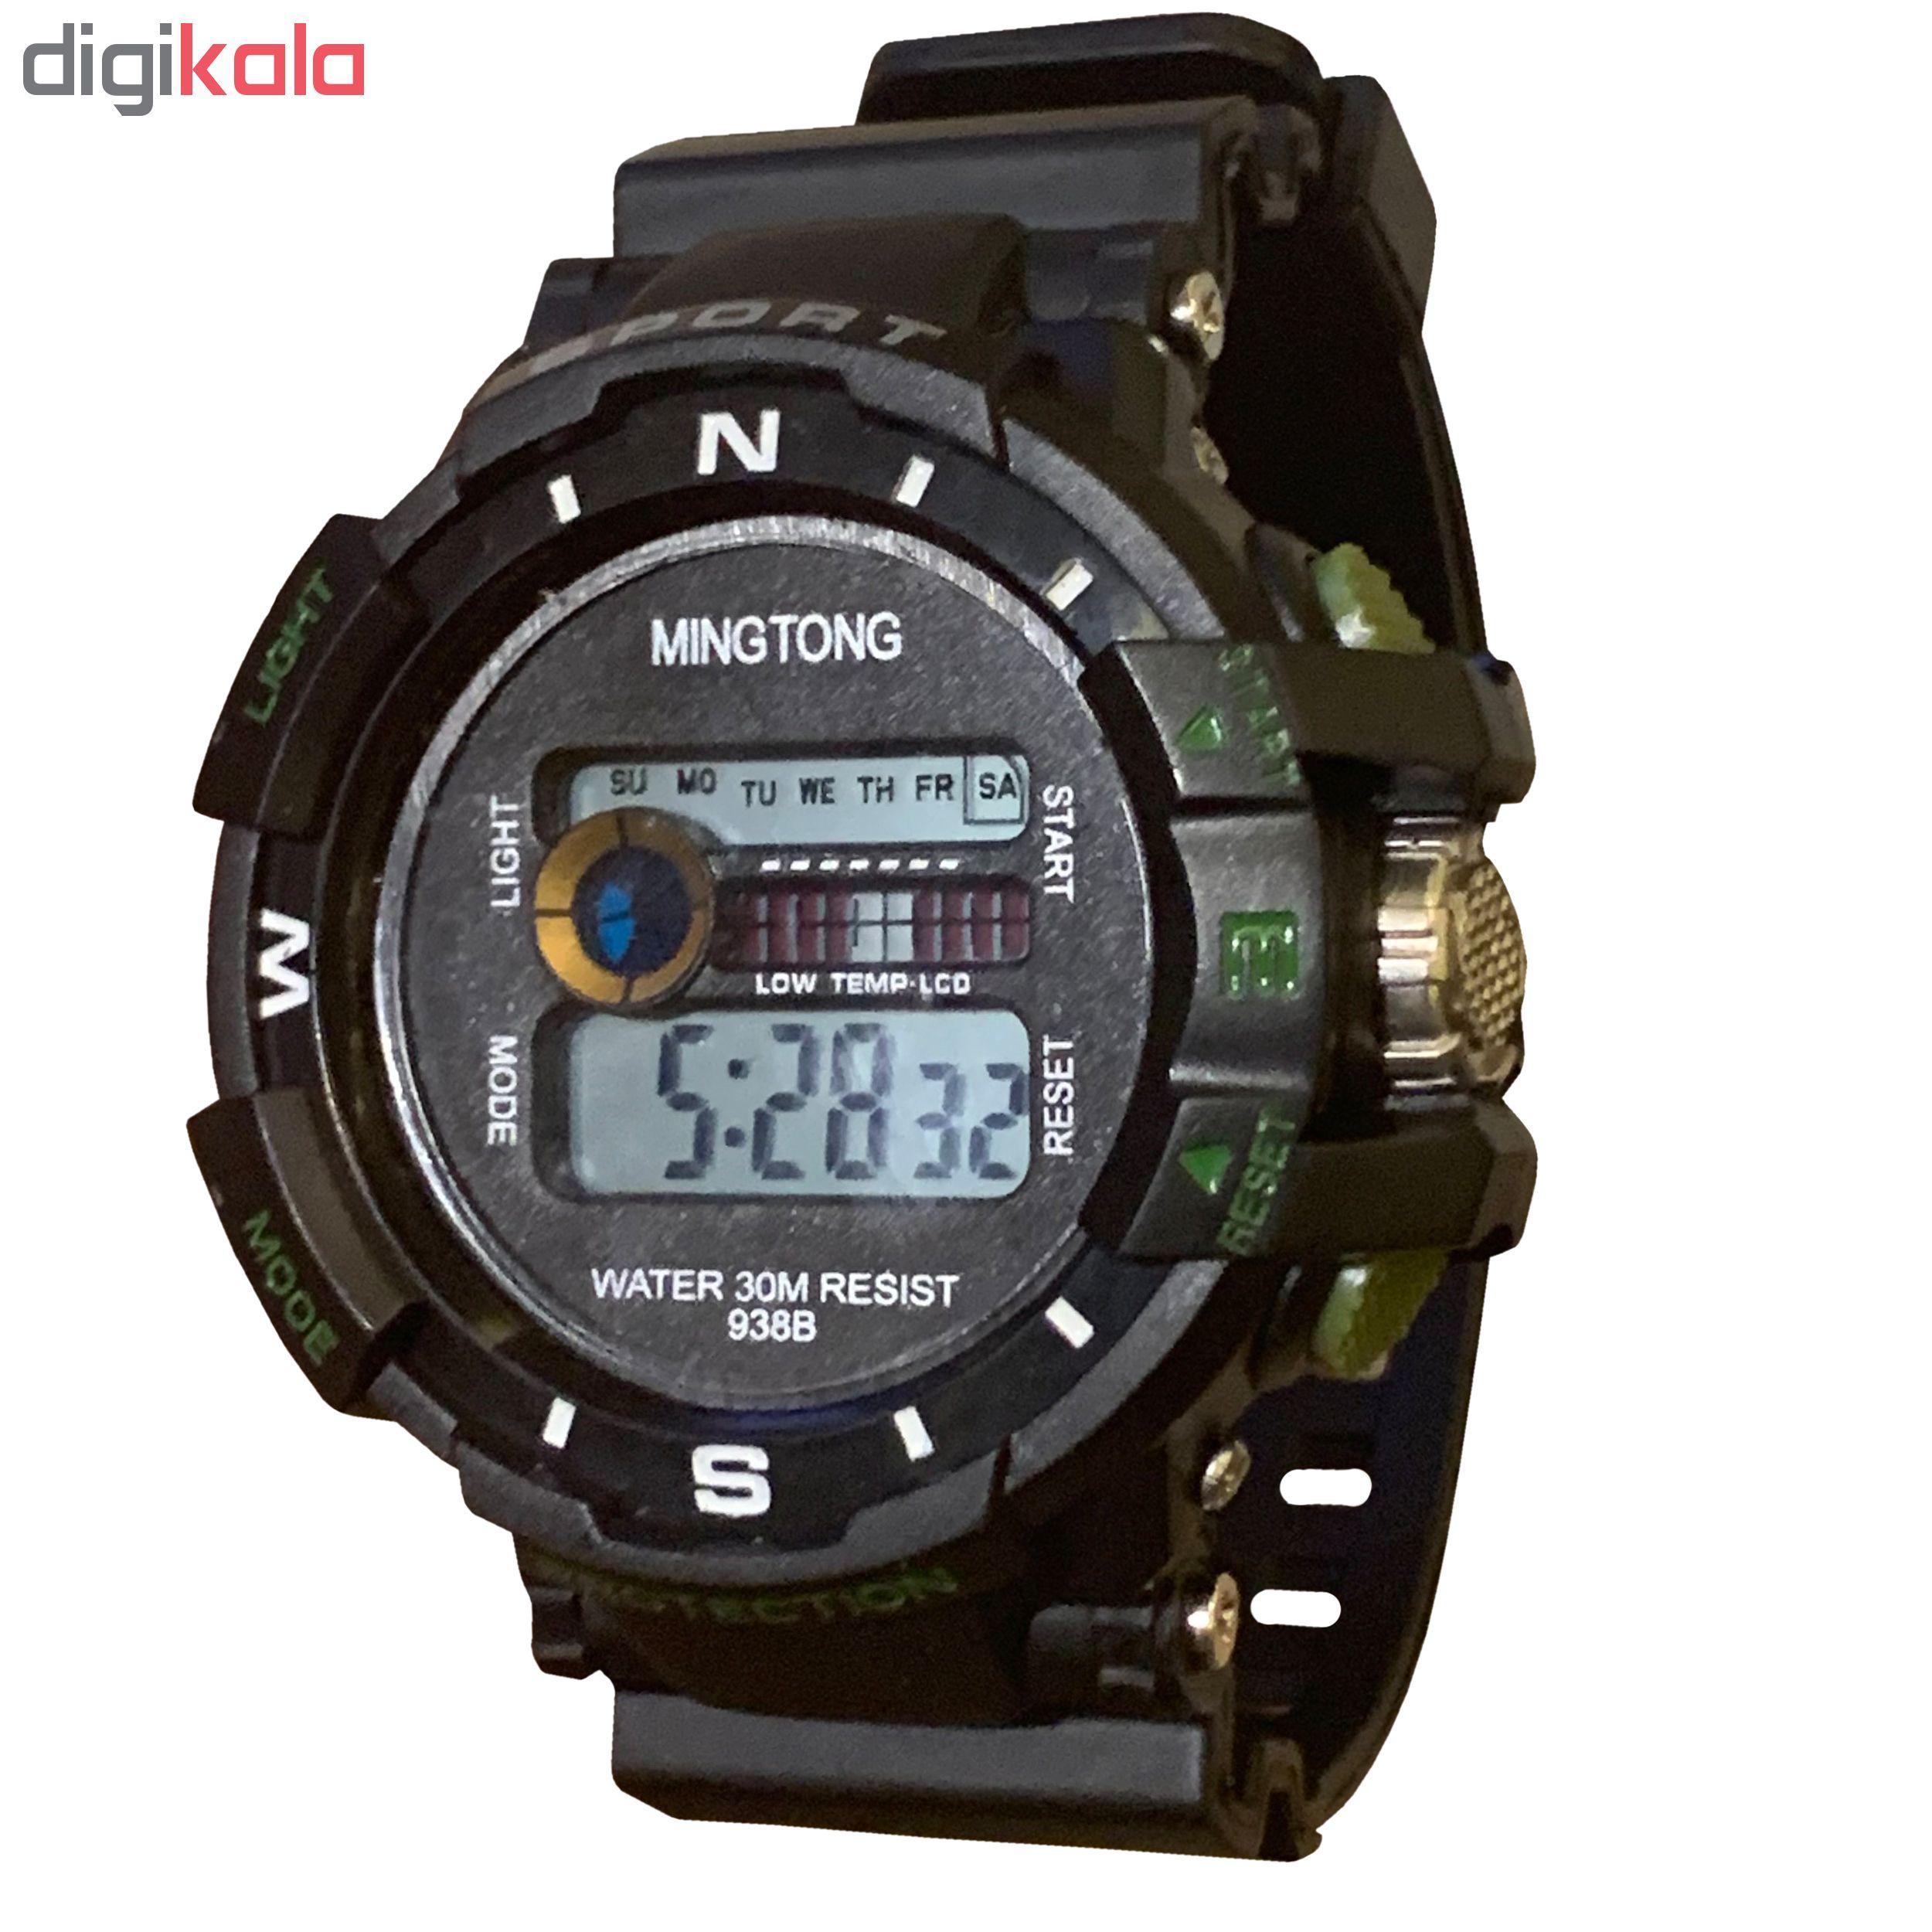 ساعت مچی دیجیتال مردانه مینگ تانگ کد B22             قیمت